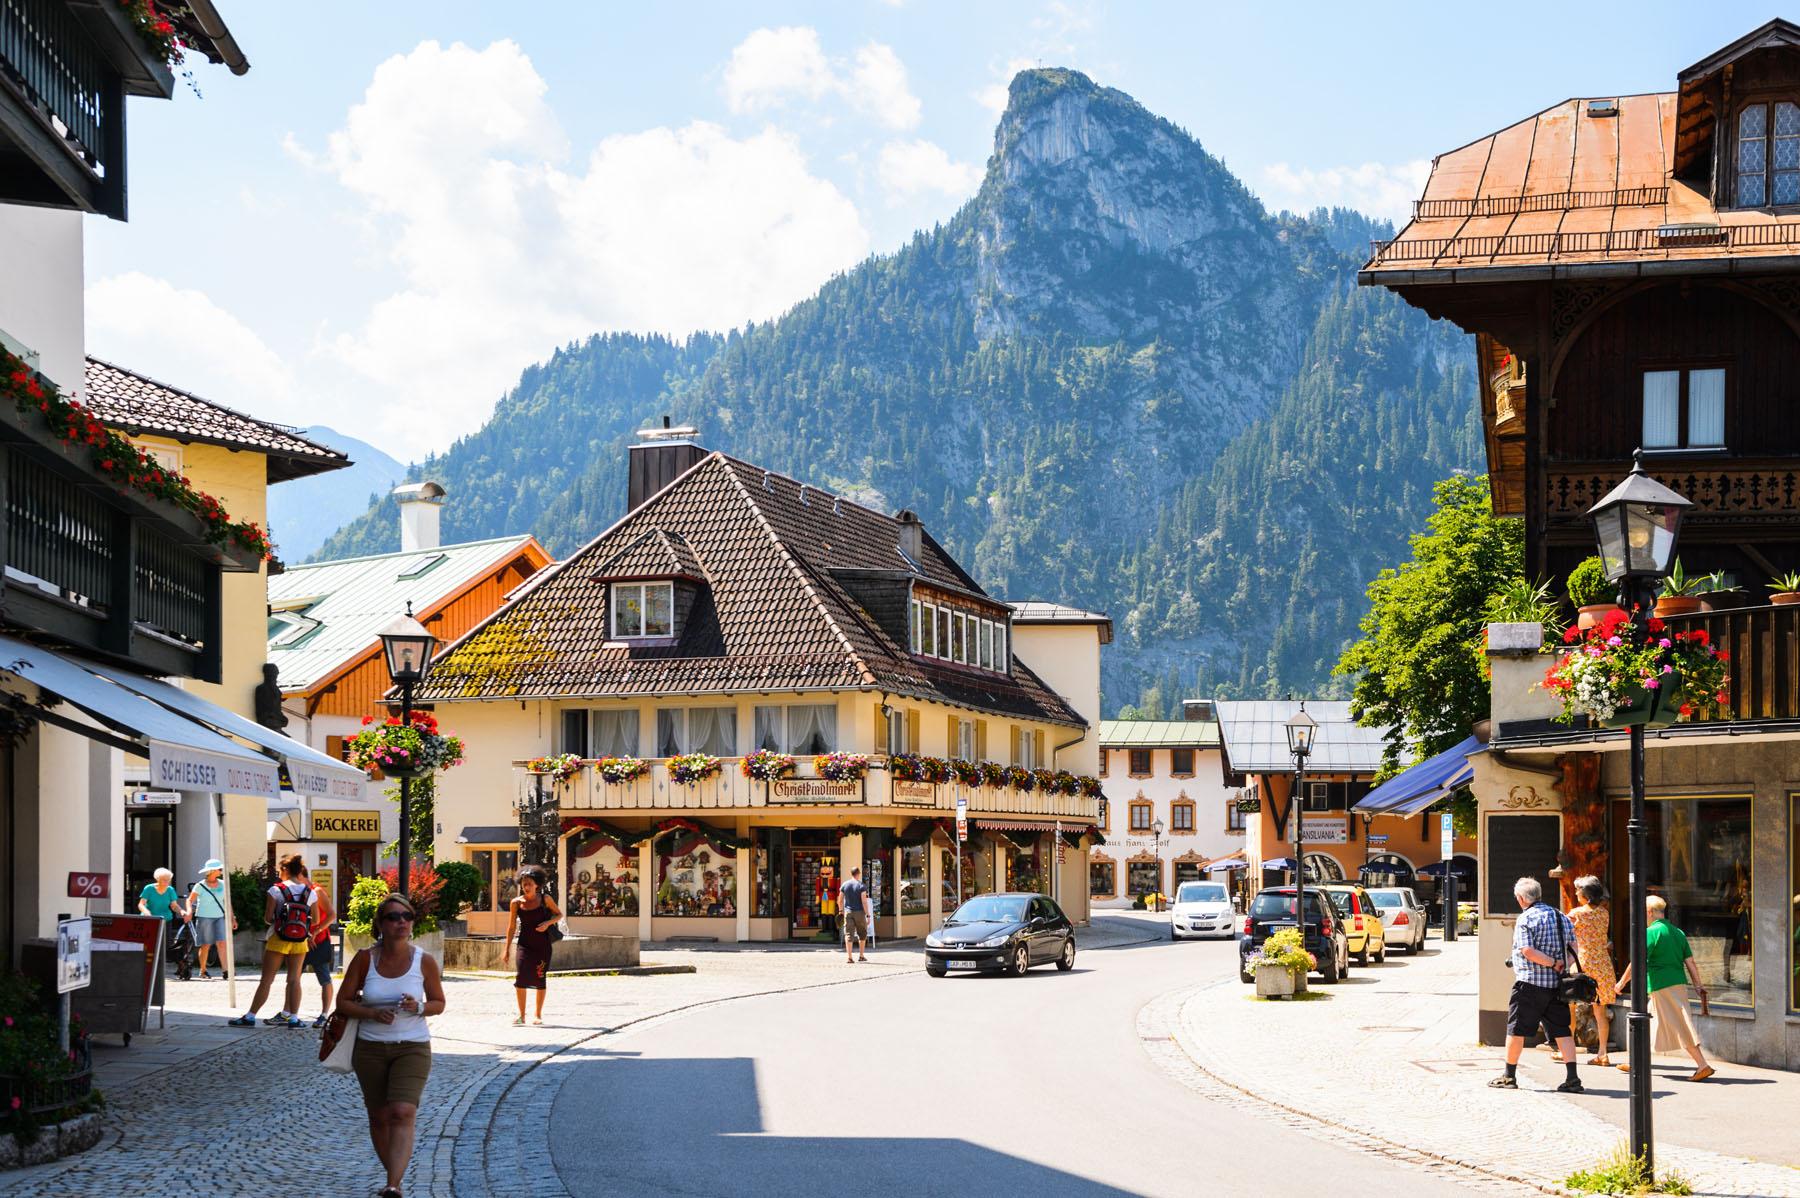 Germany-Bavaria-Oberammergau_309388487